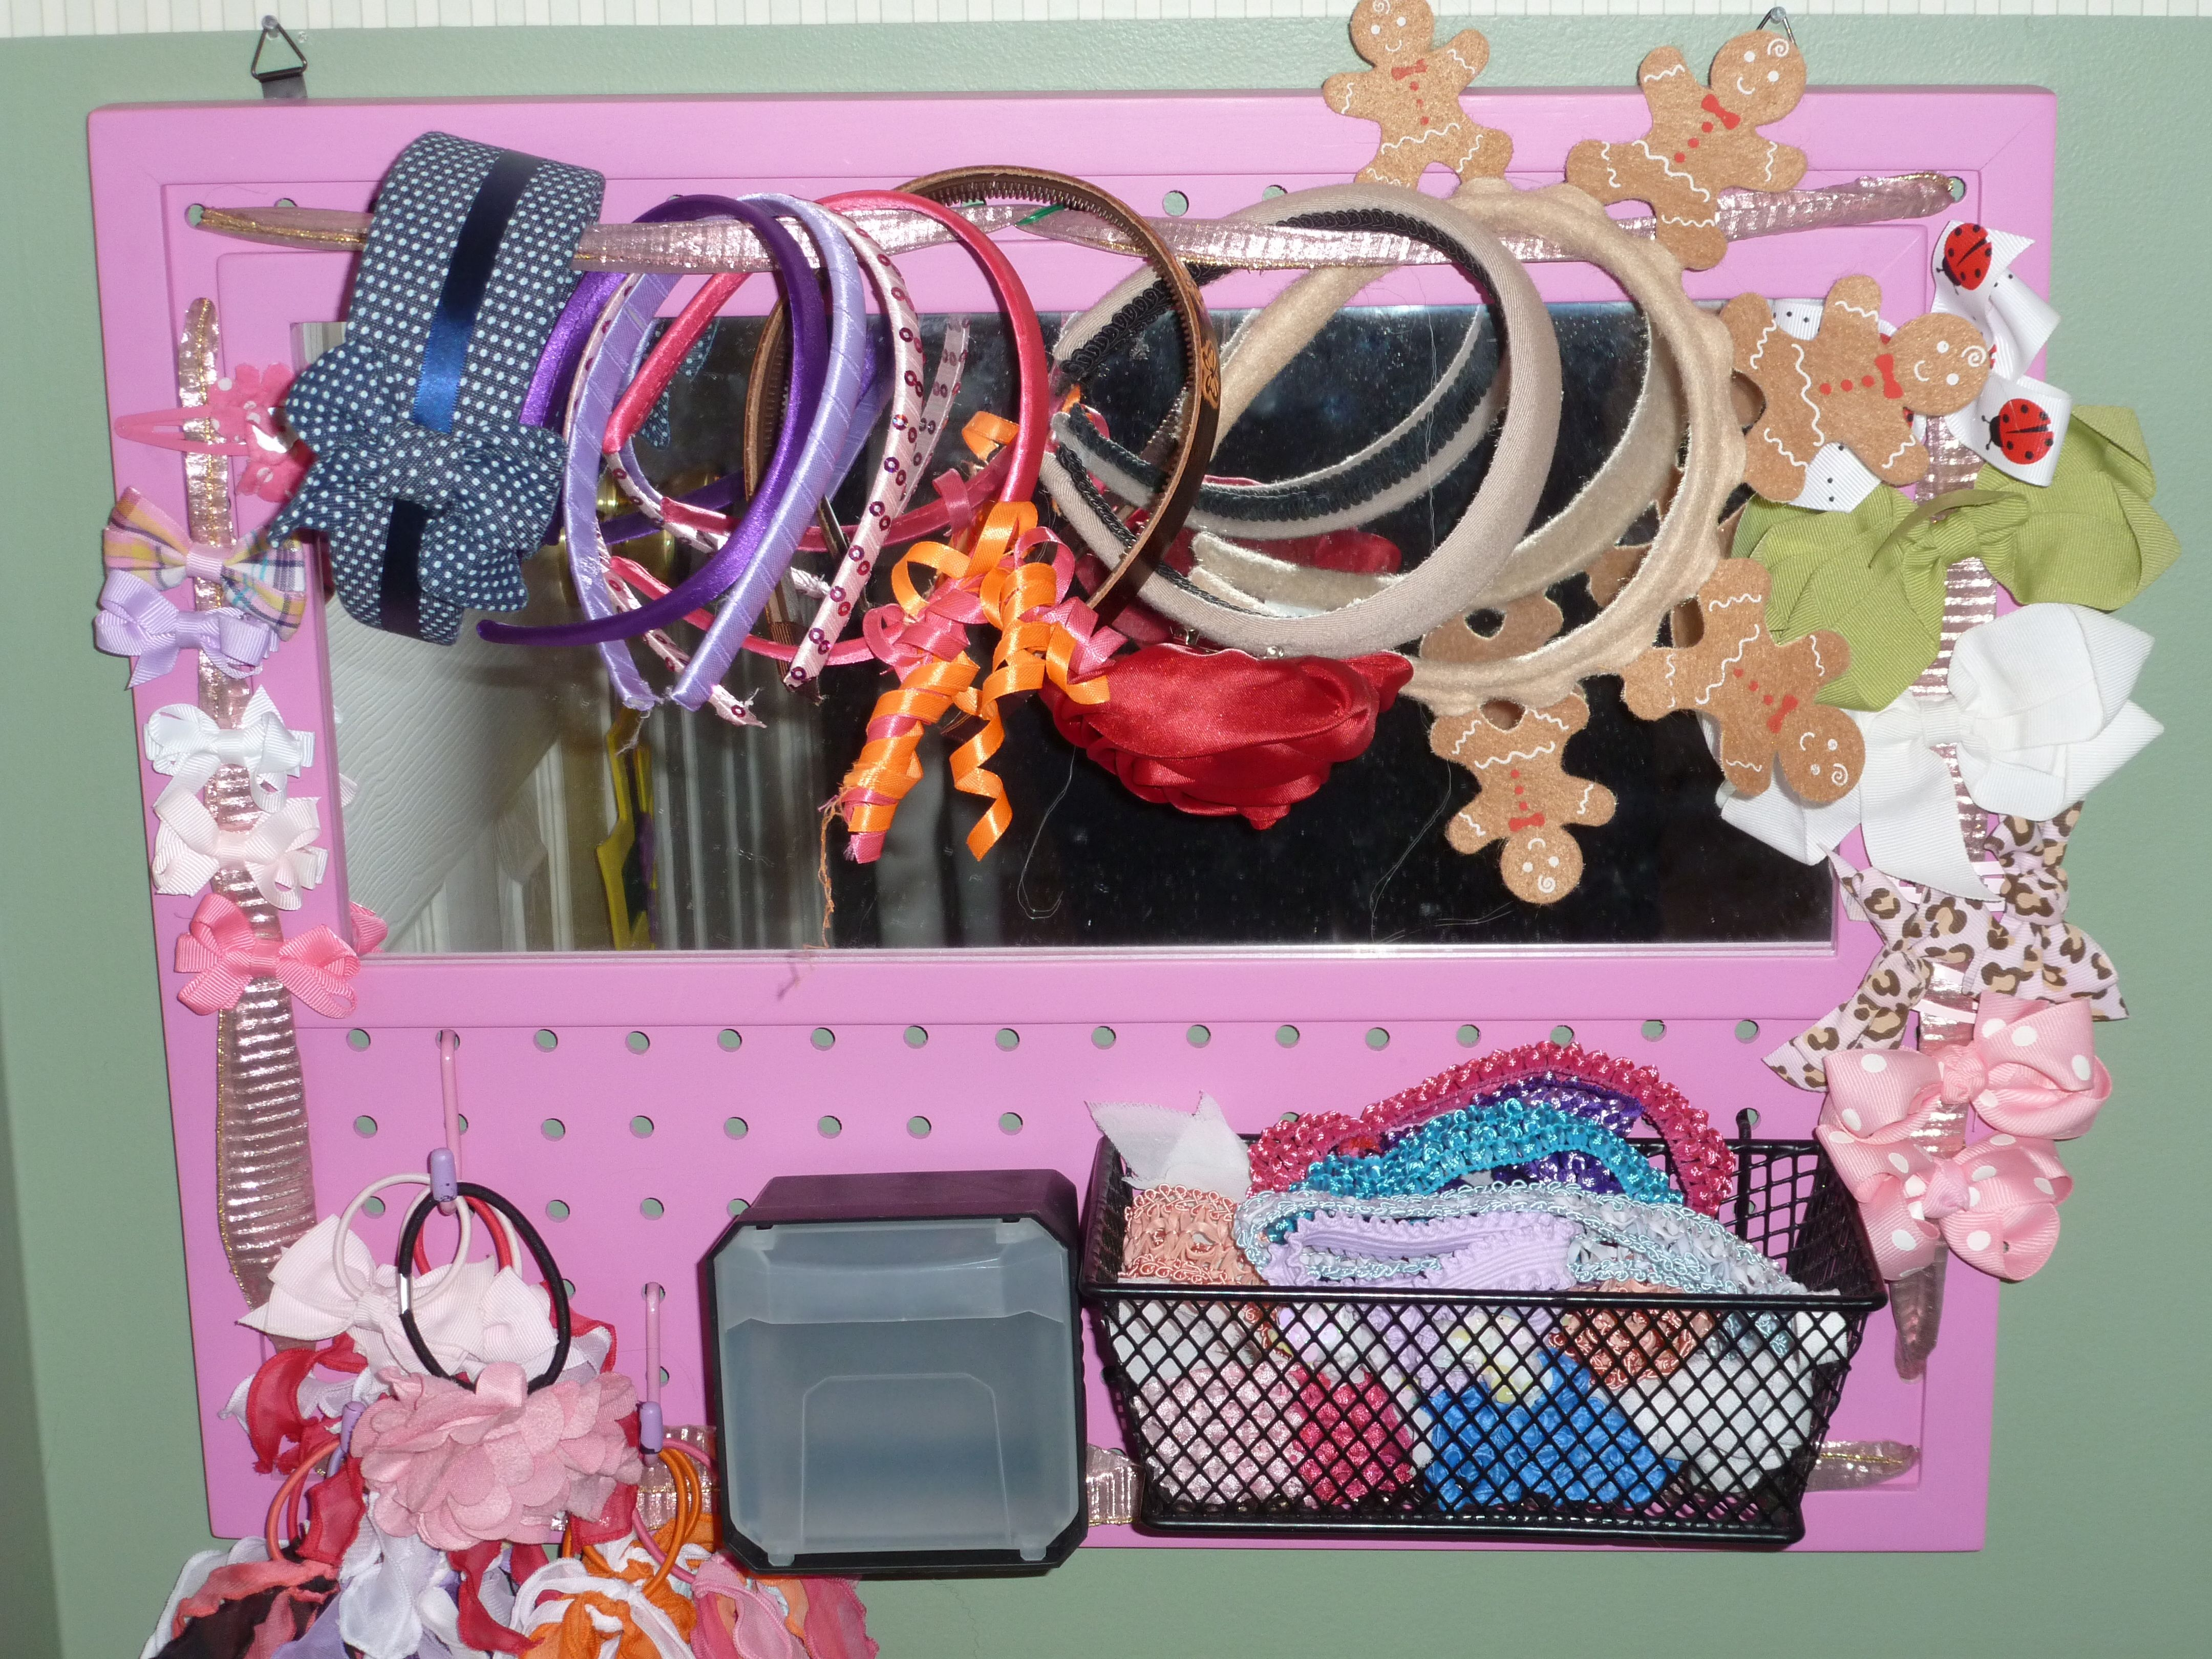 Little girl hair accessory organizer Organizing hair